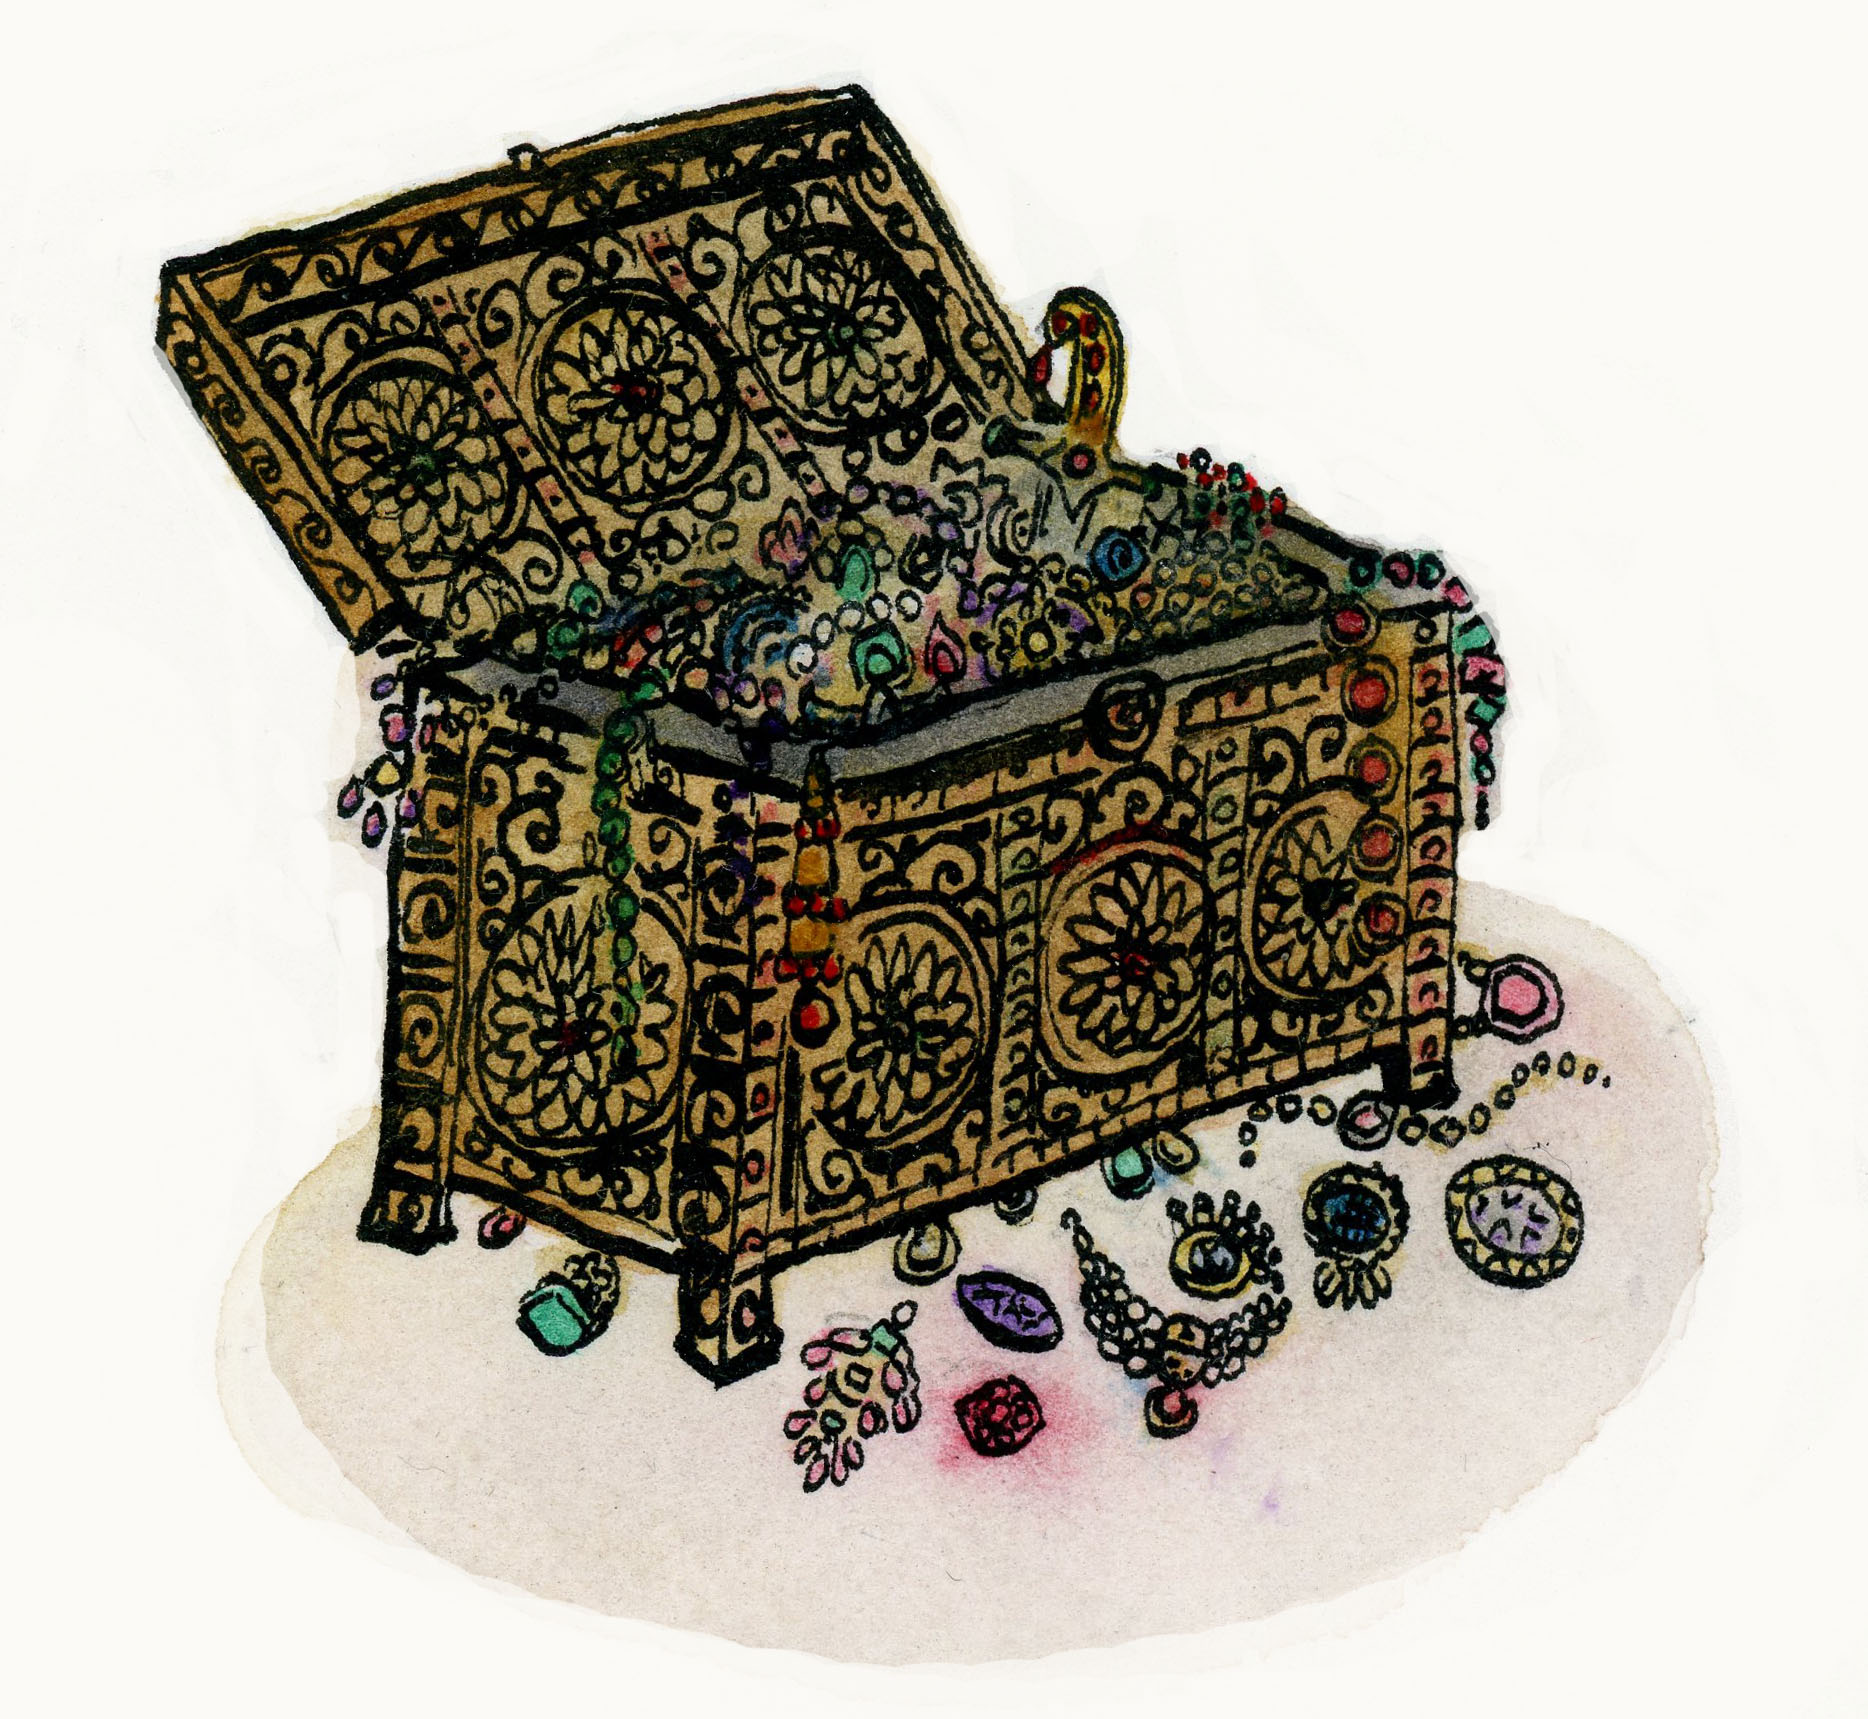 33.-The-treasure